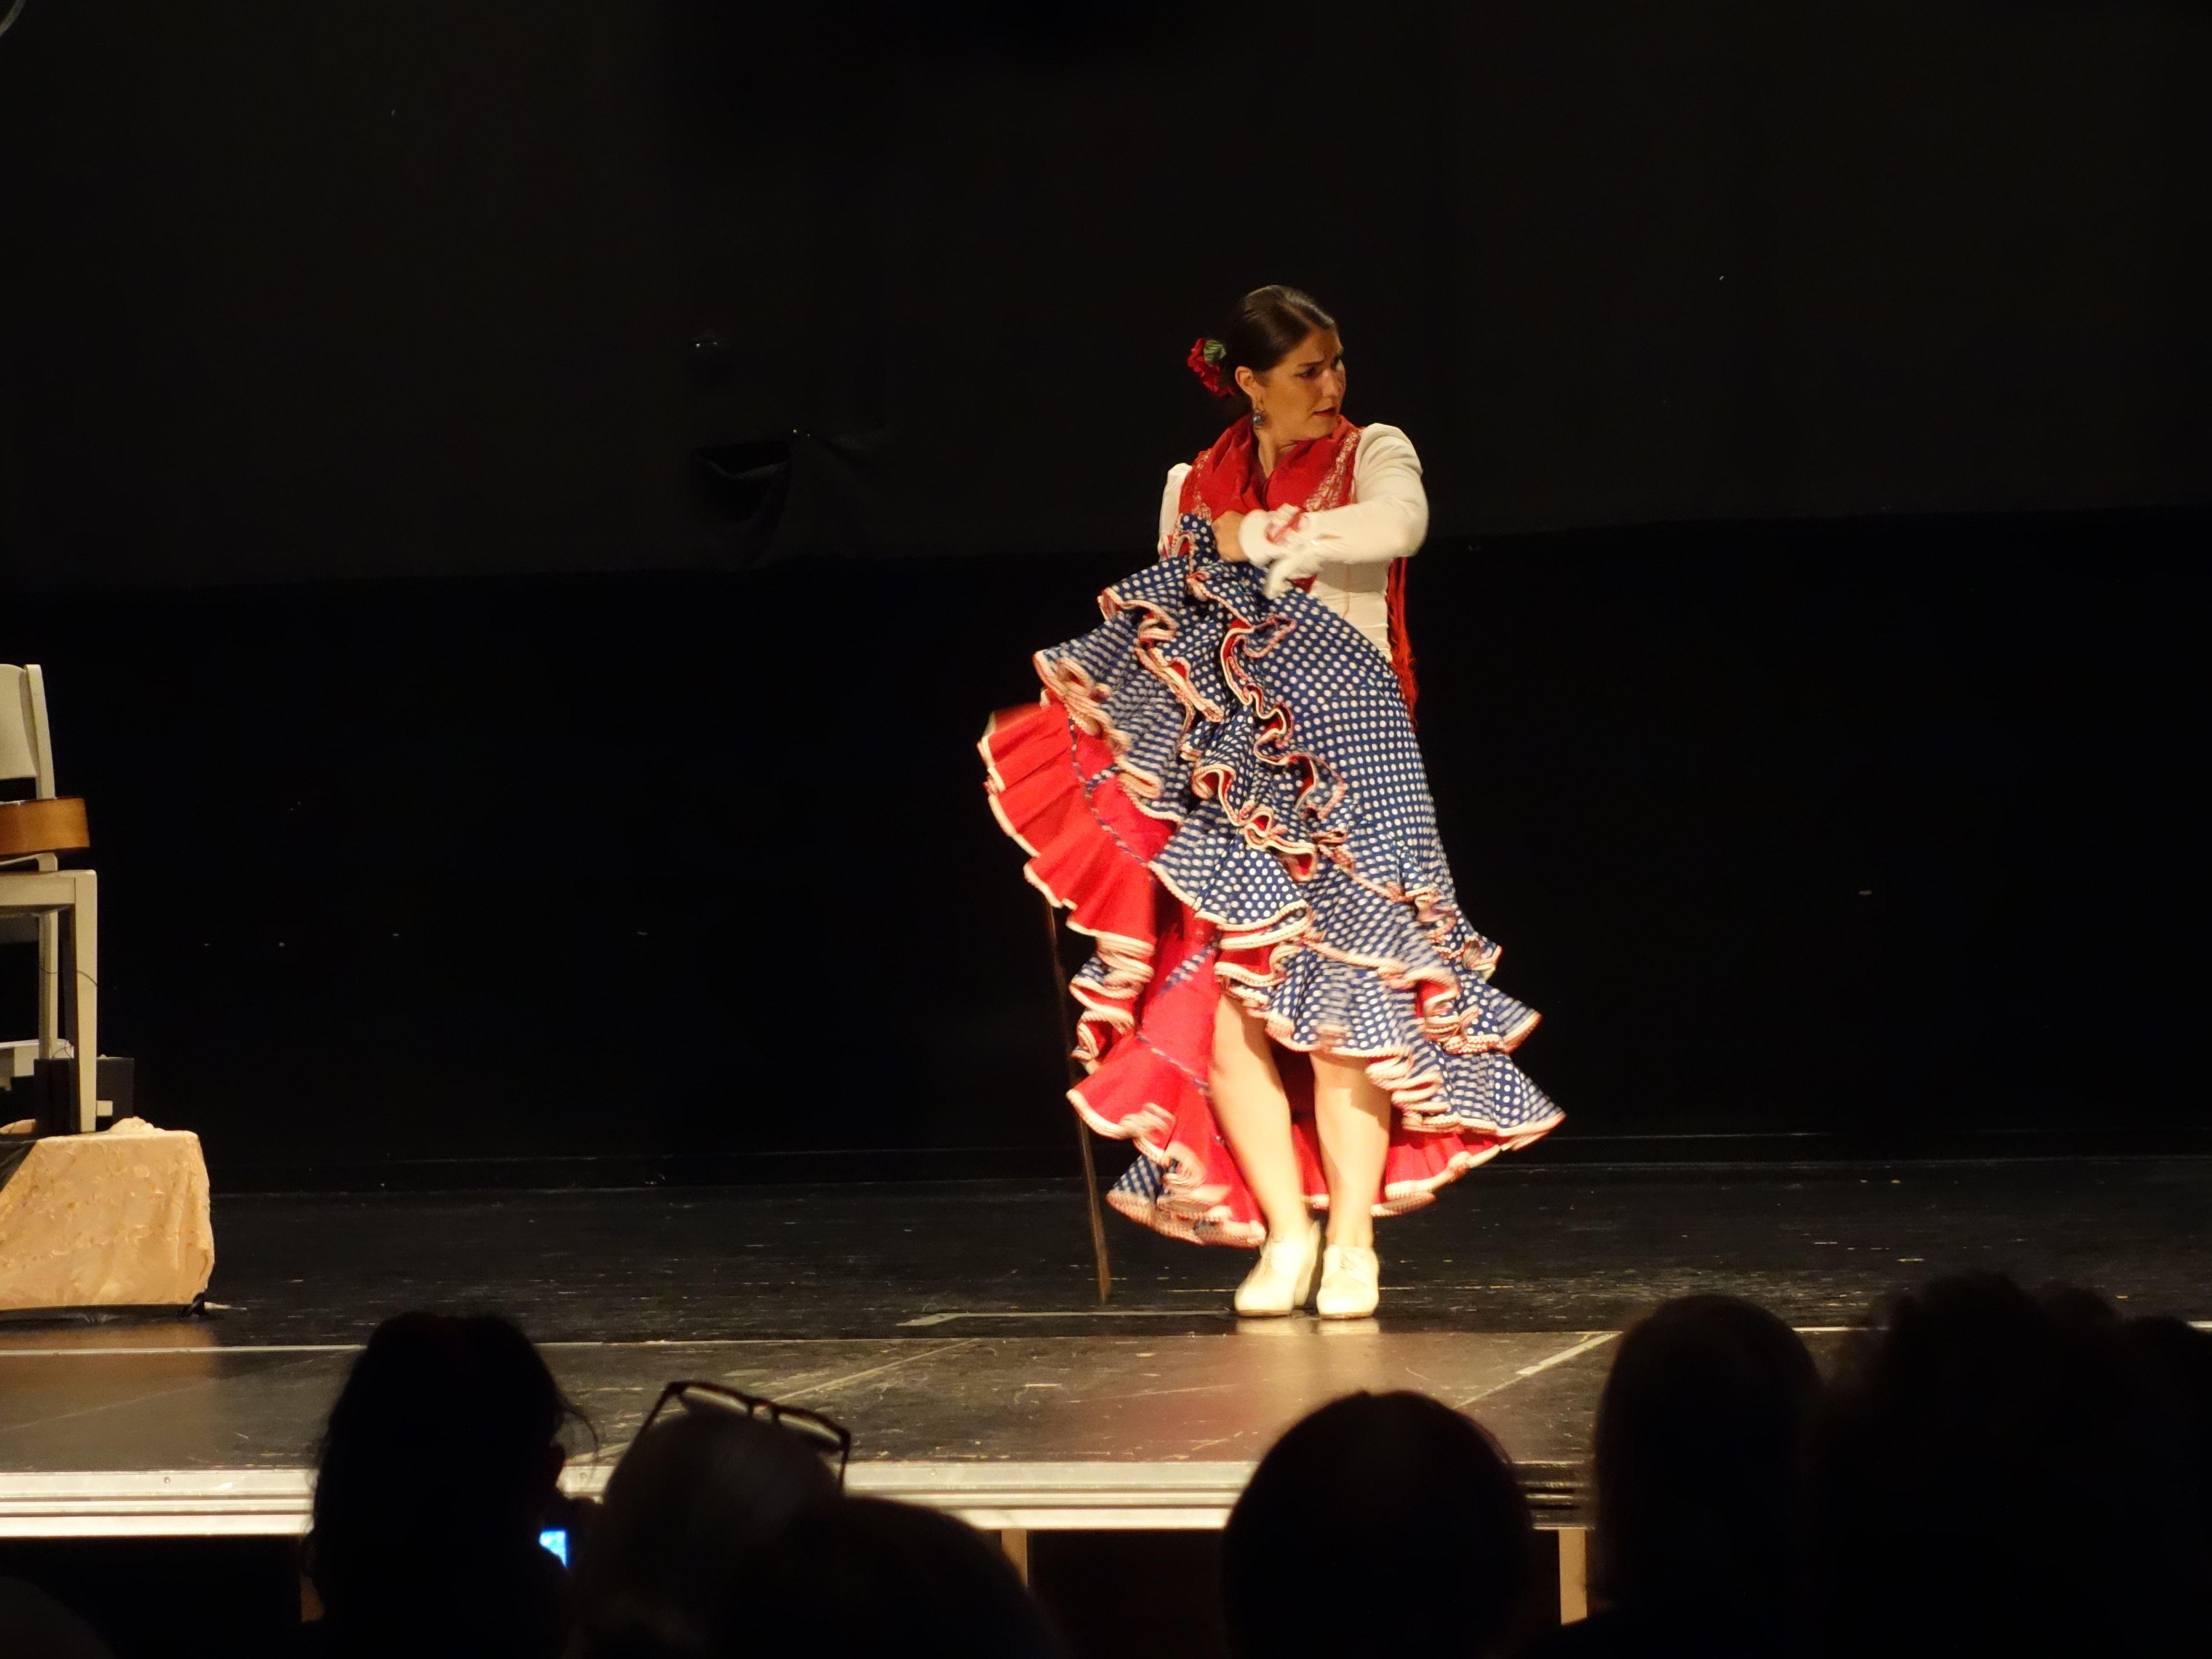 Flamencouppvisning